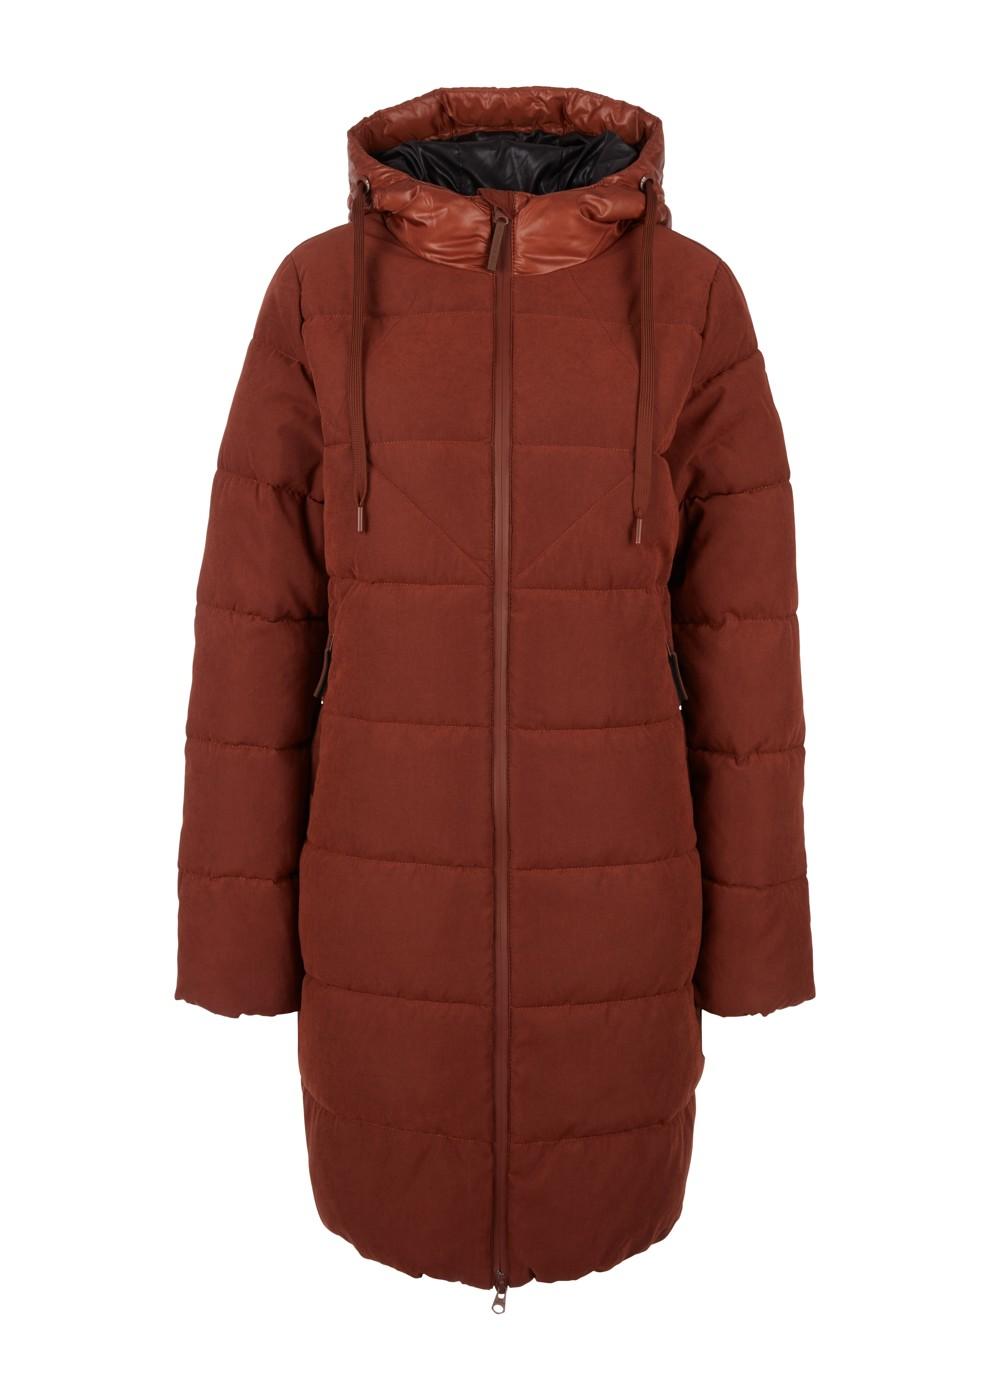 510 Mantel langarm - Damen